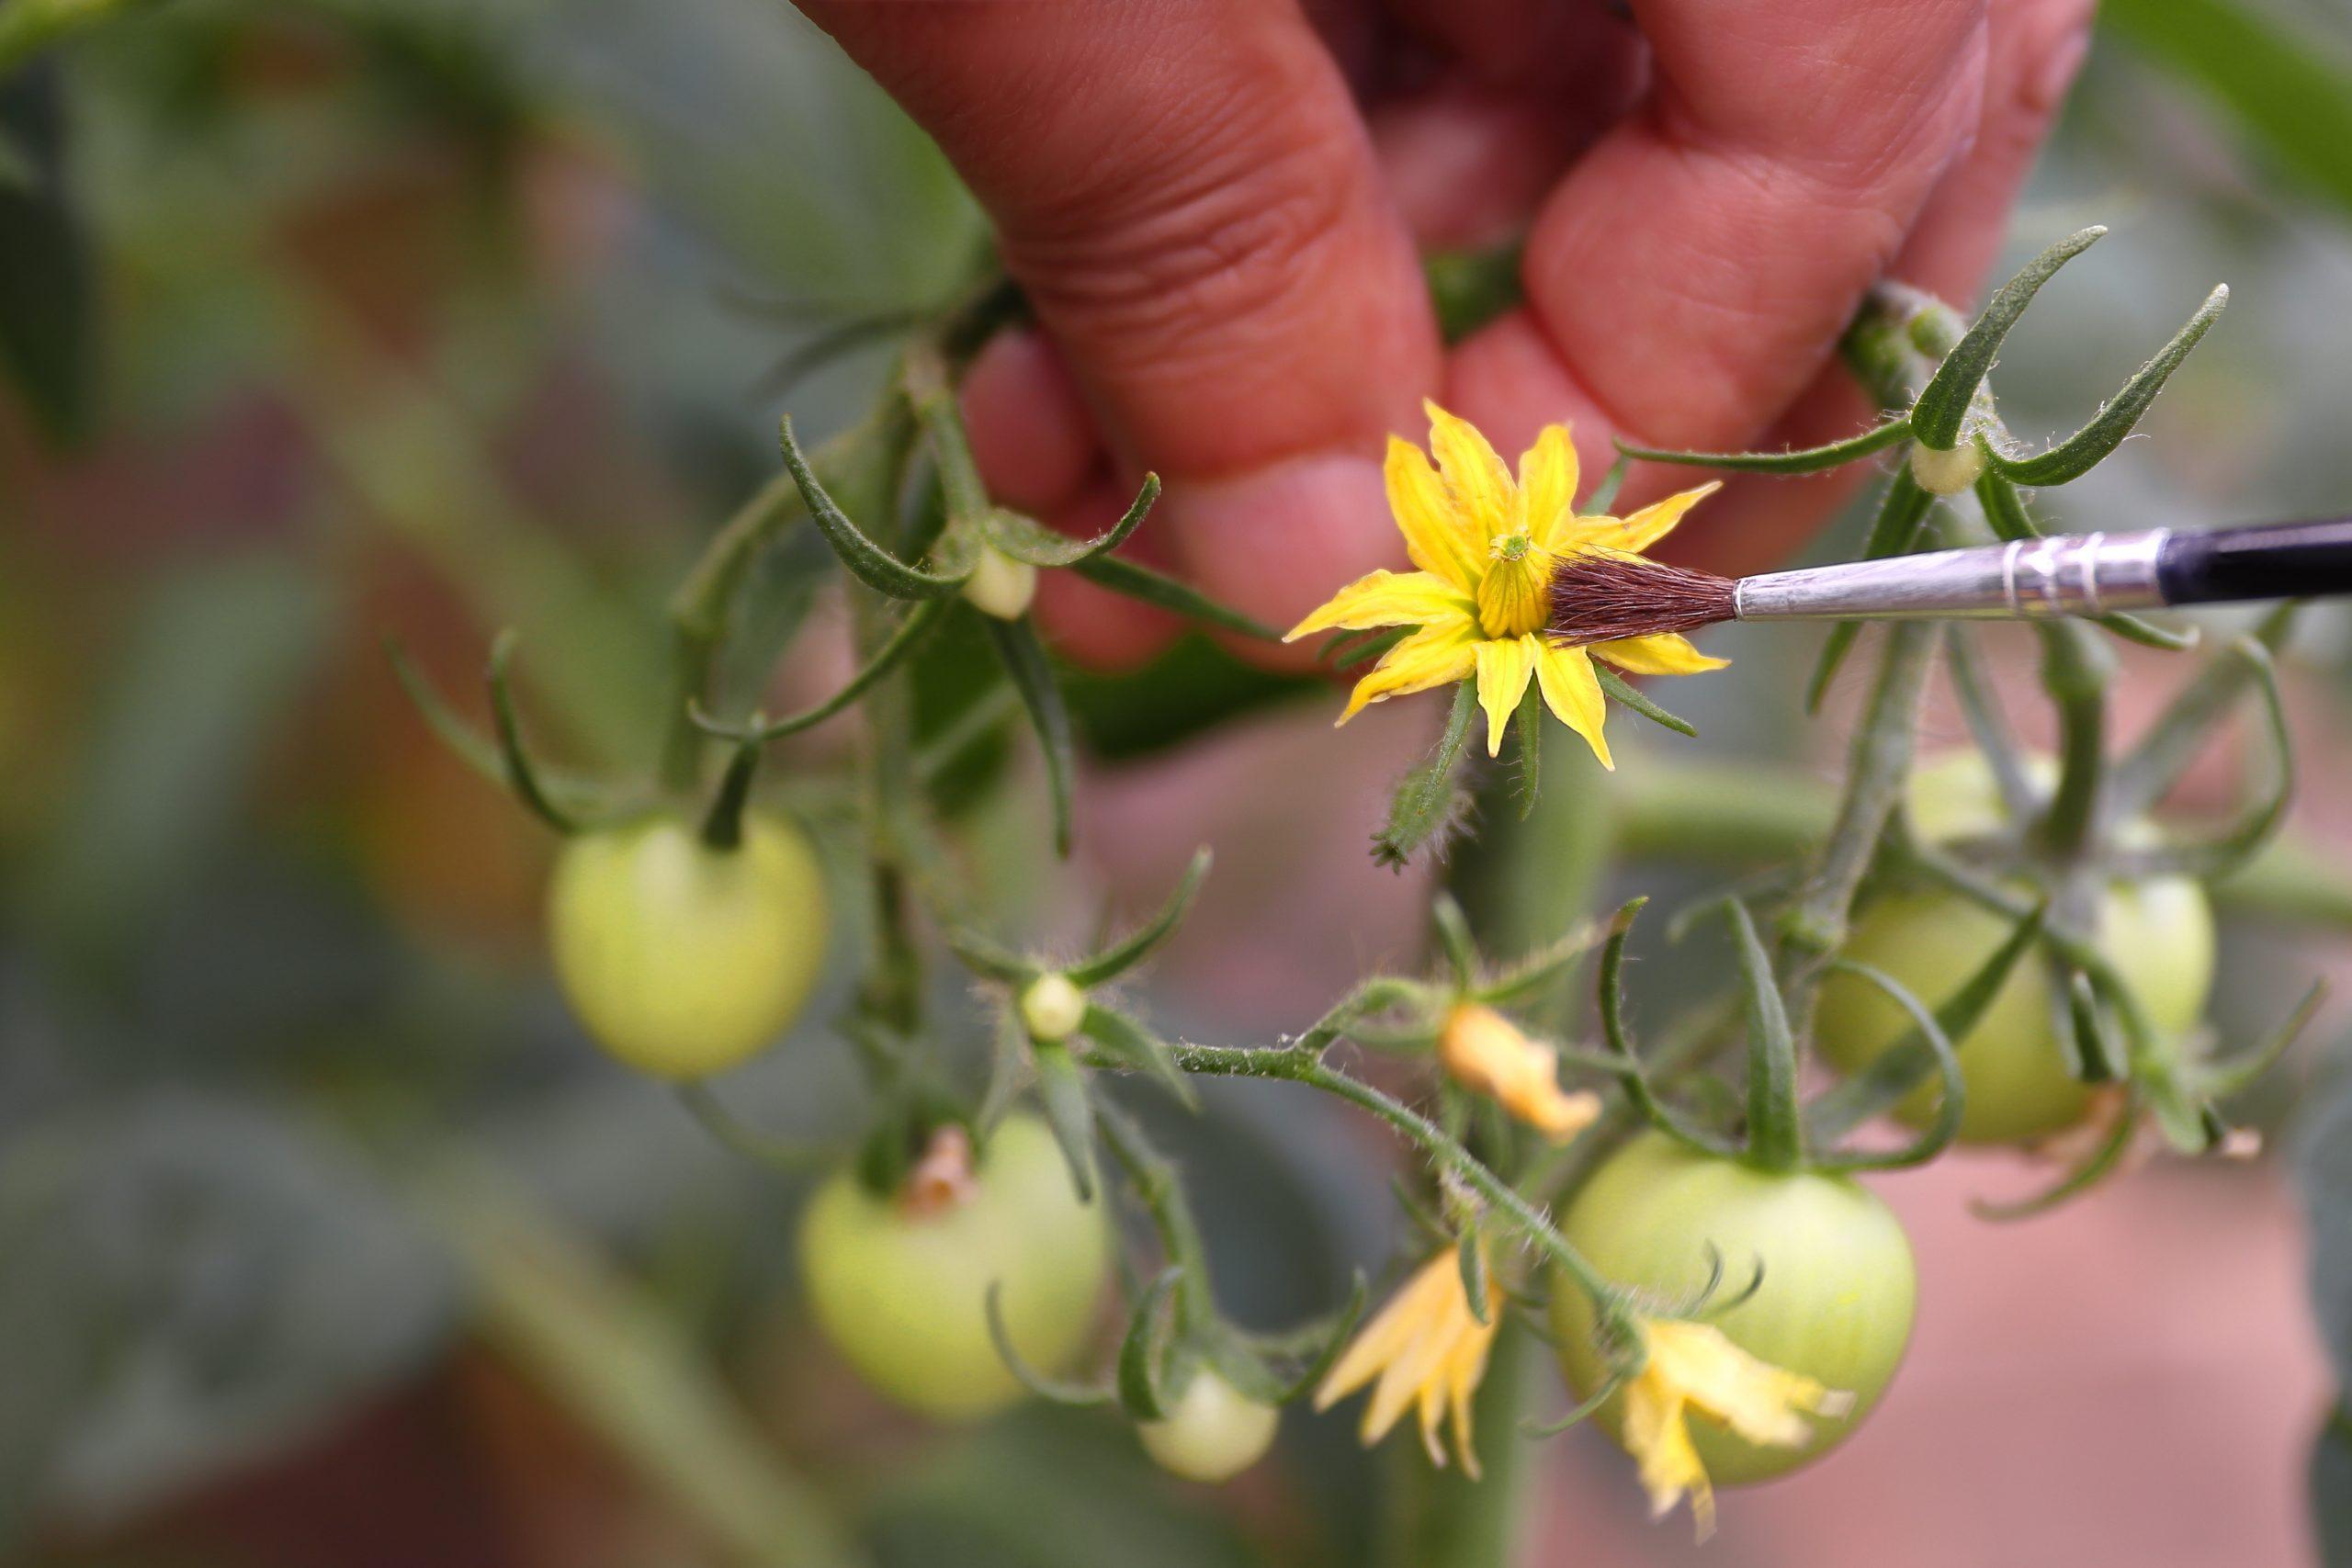 La pollinisation manuelle